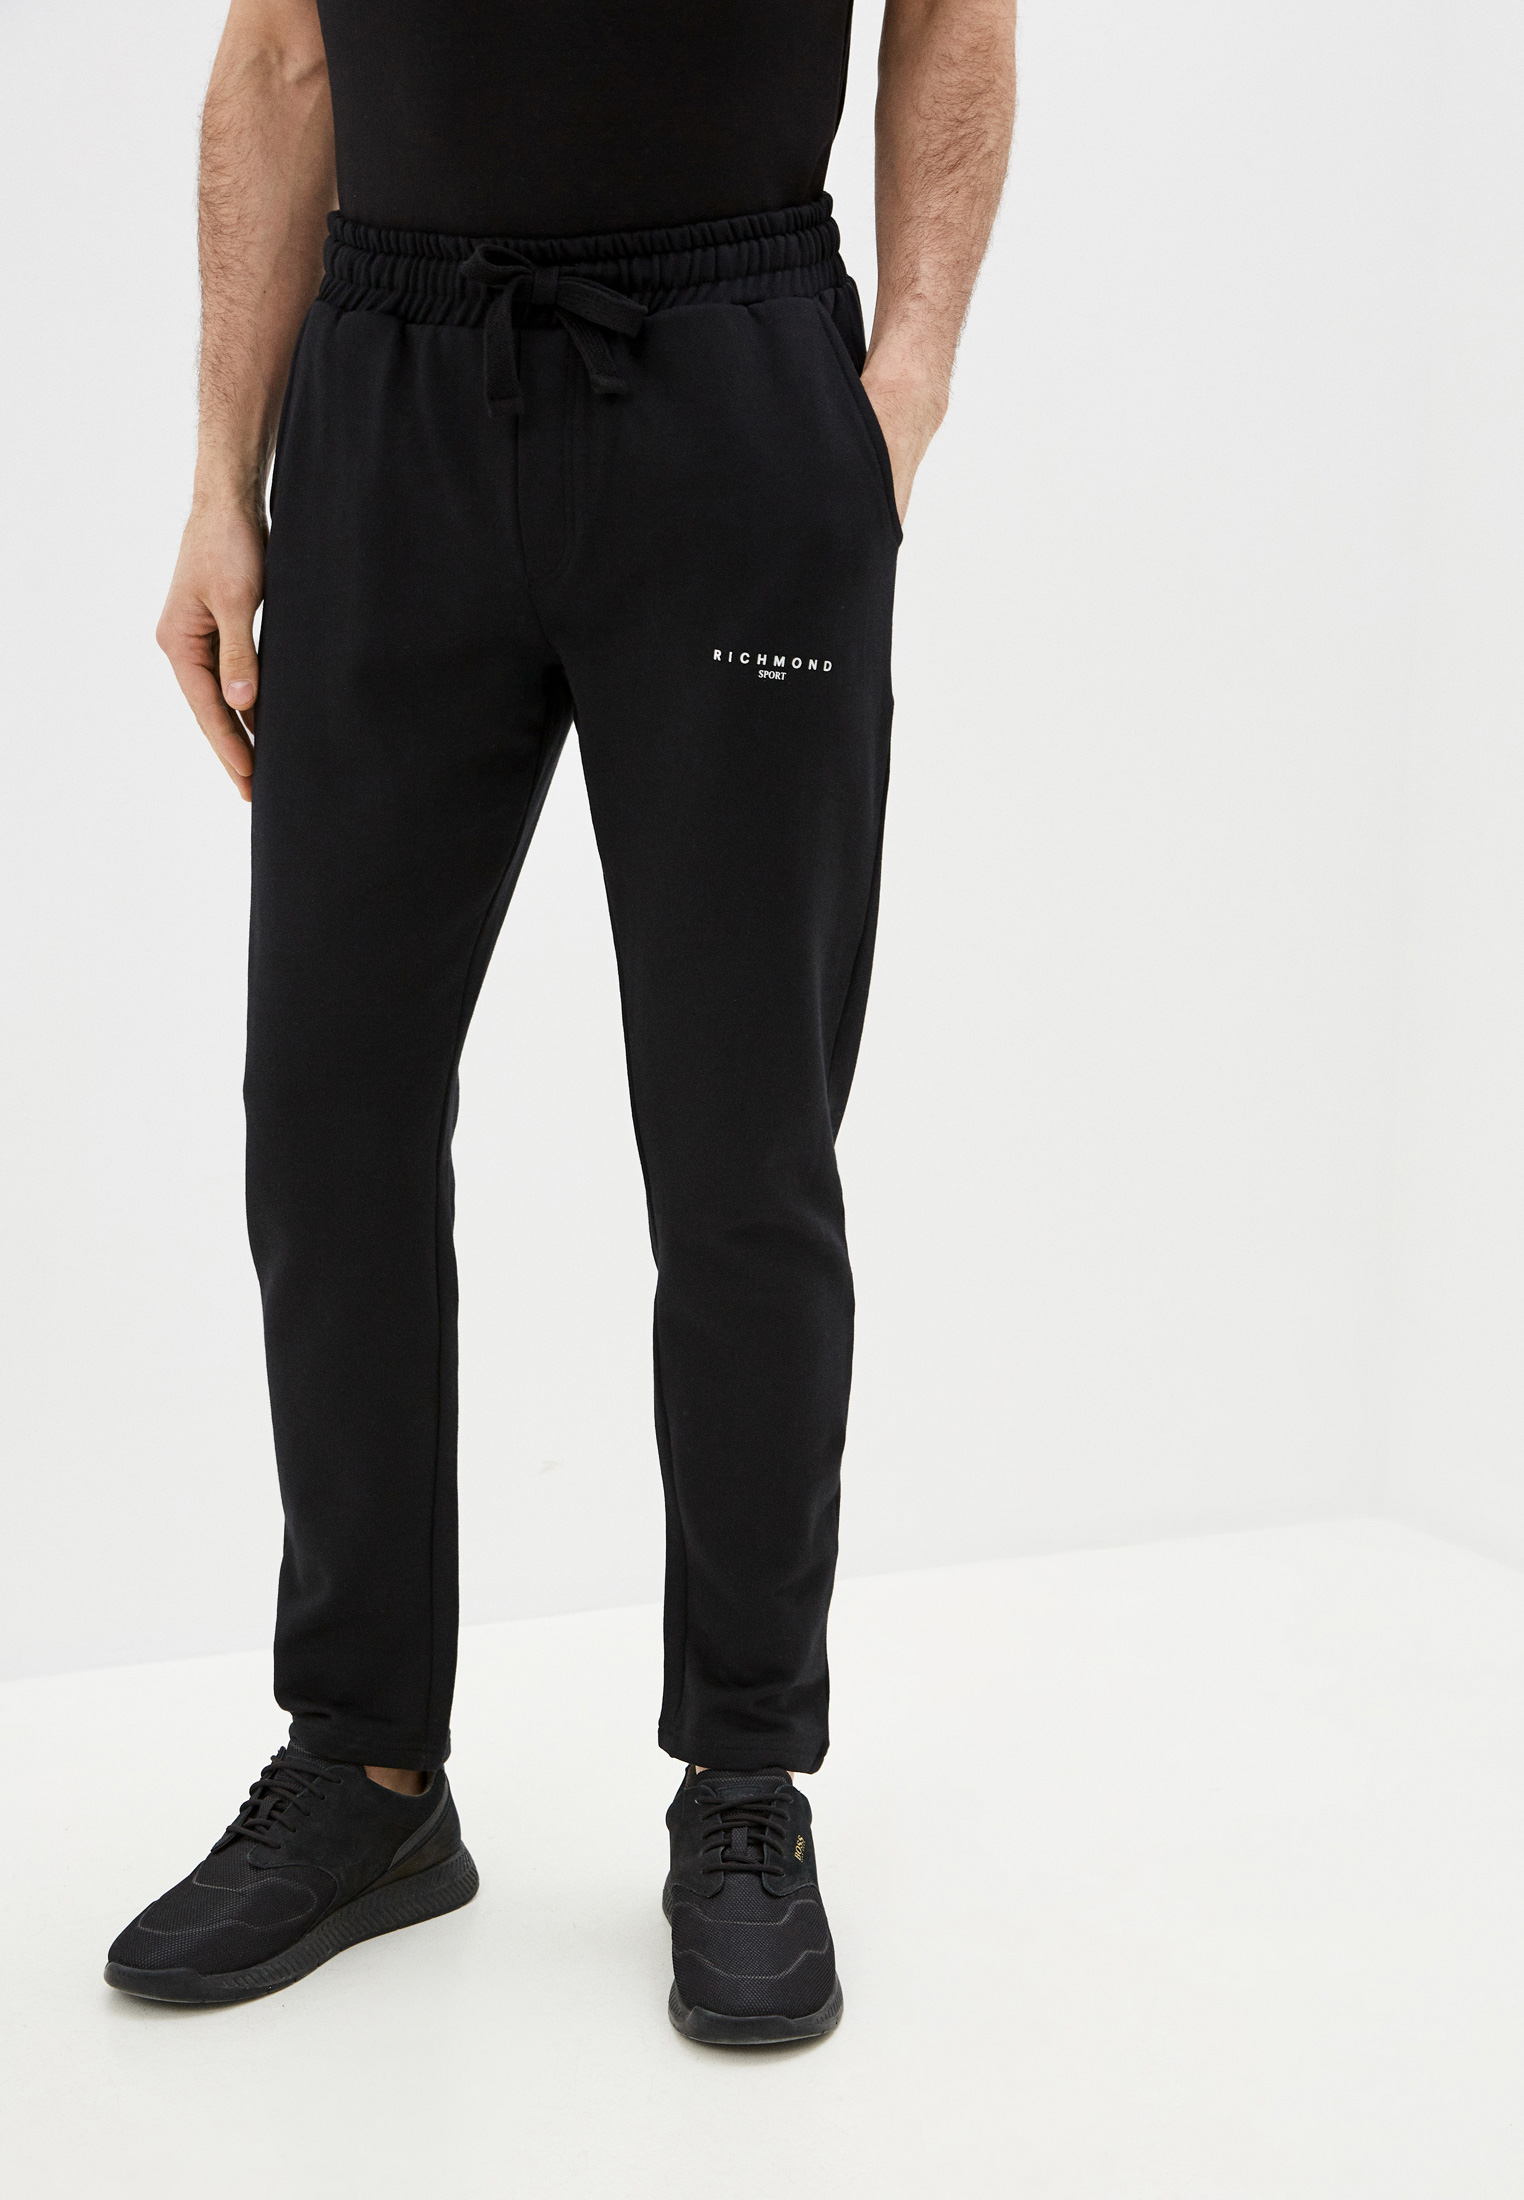 Мужские спортивные брюки John Richmond (Джон Ричмонд) UMA19007PA